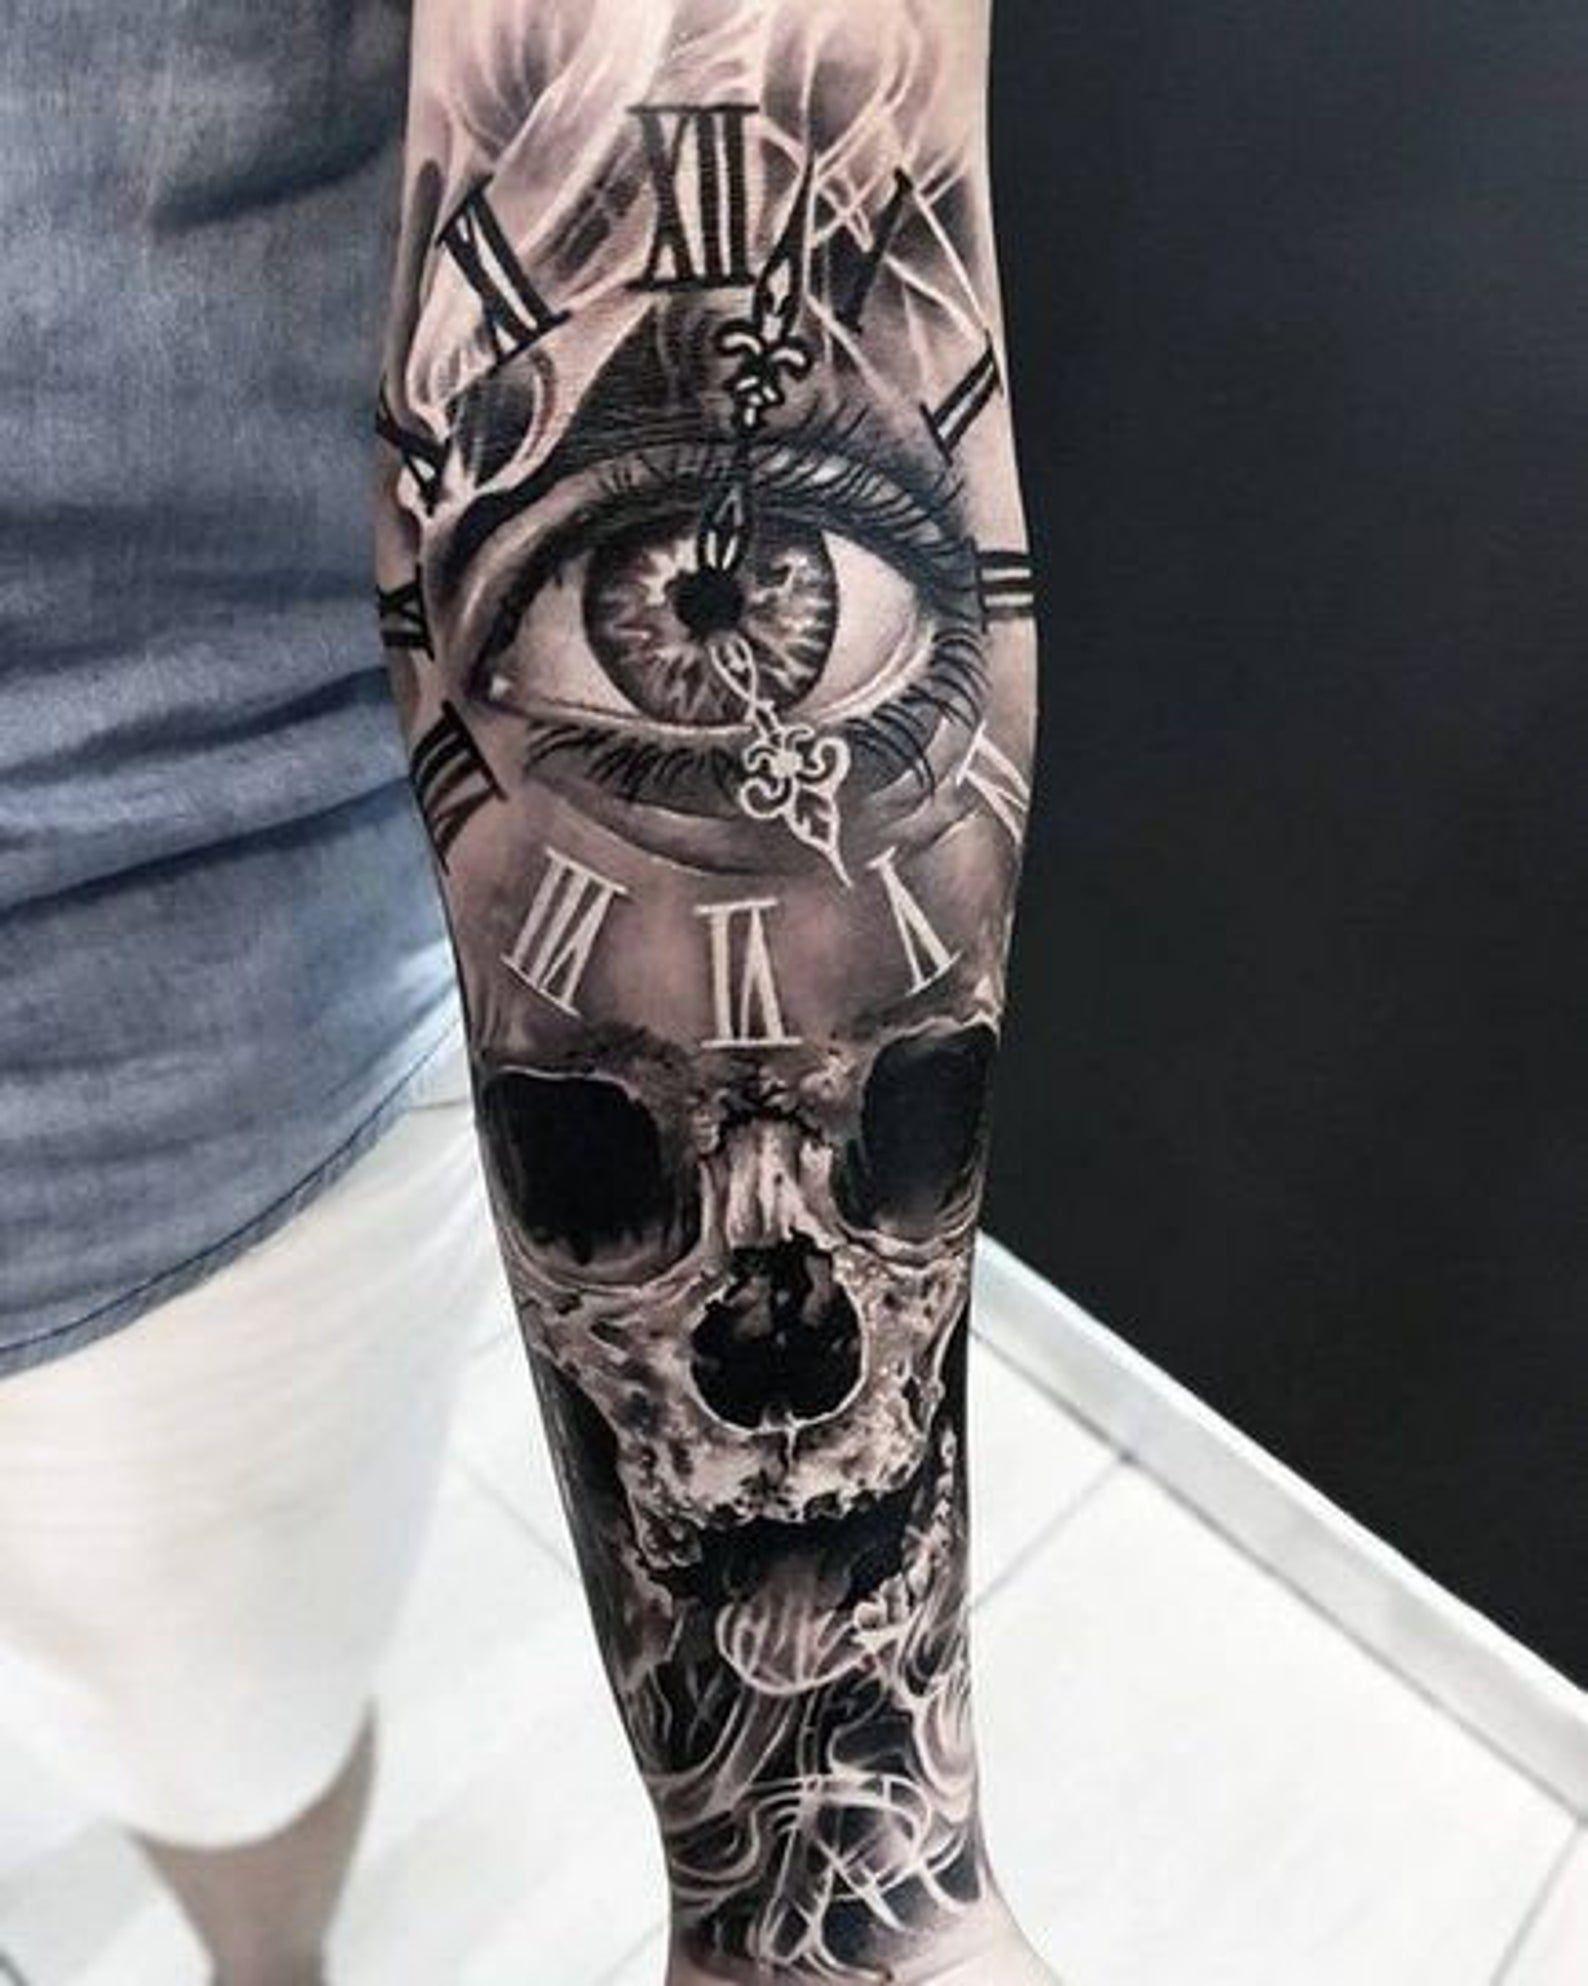 Make temporary tattoos etsy in 2020 full sleeve